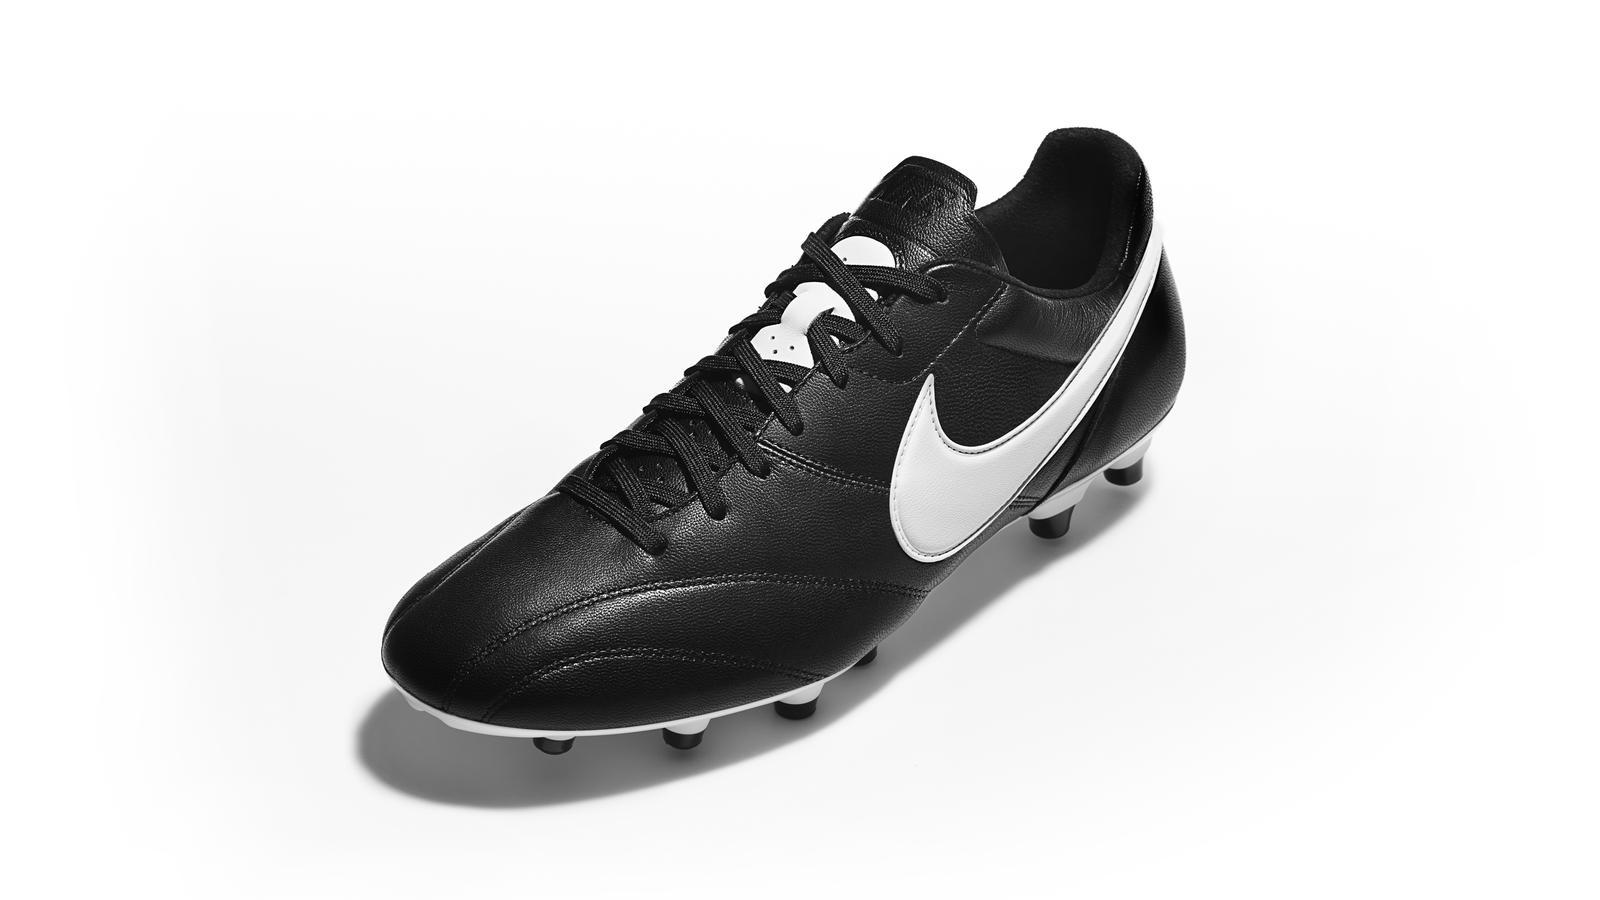 The Nike Premier 3/4